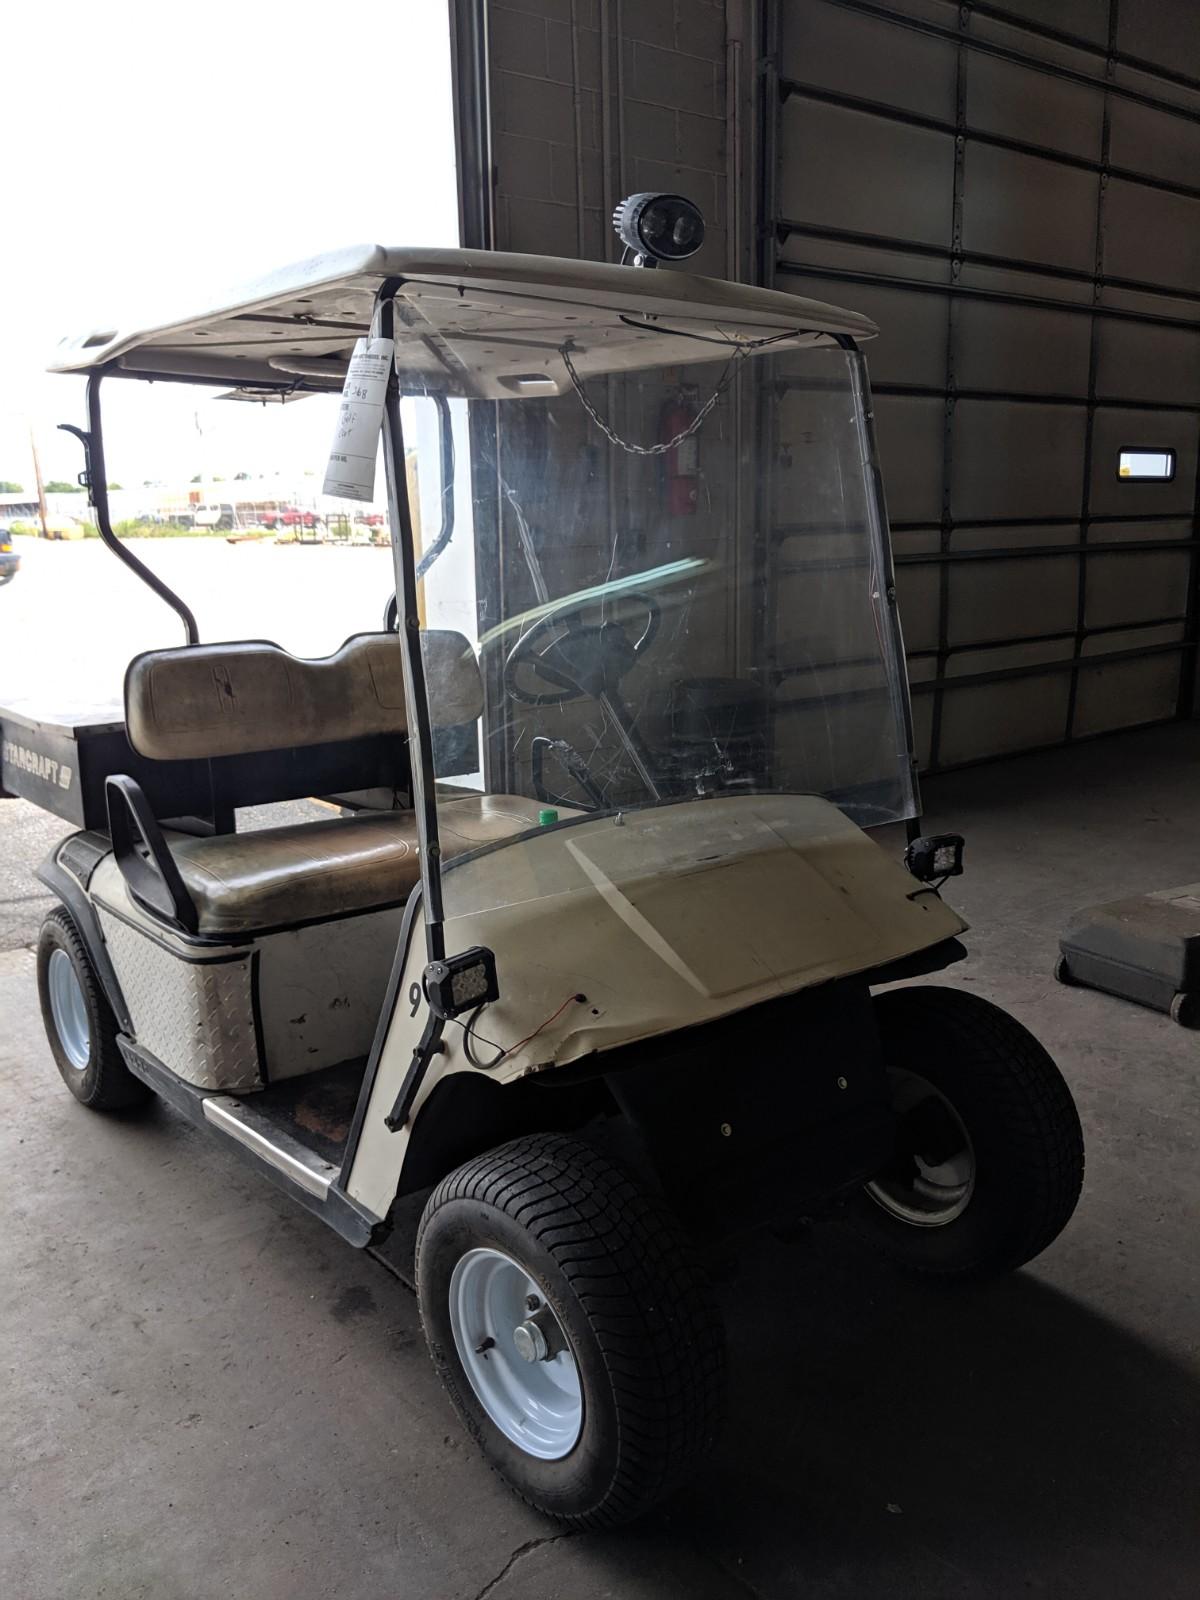 Lot 368 - EZ Go Golf Cart